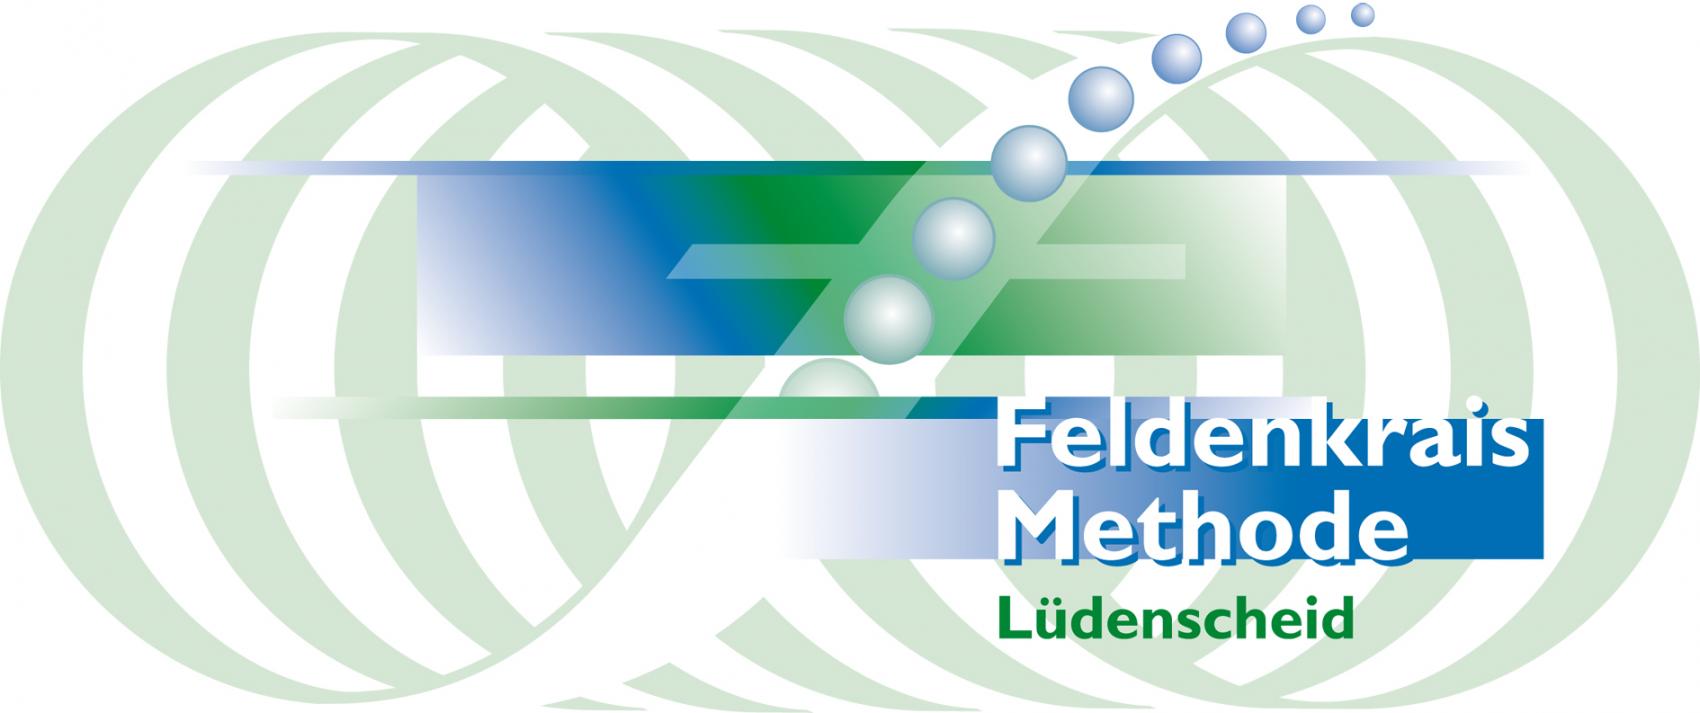 Logo Feldenkrais Methode Lüdenscheid